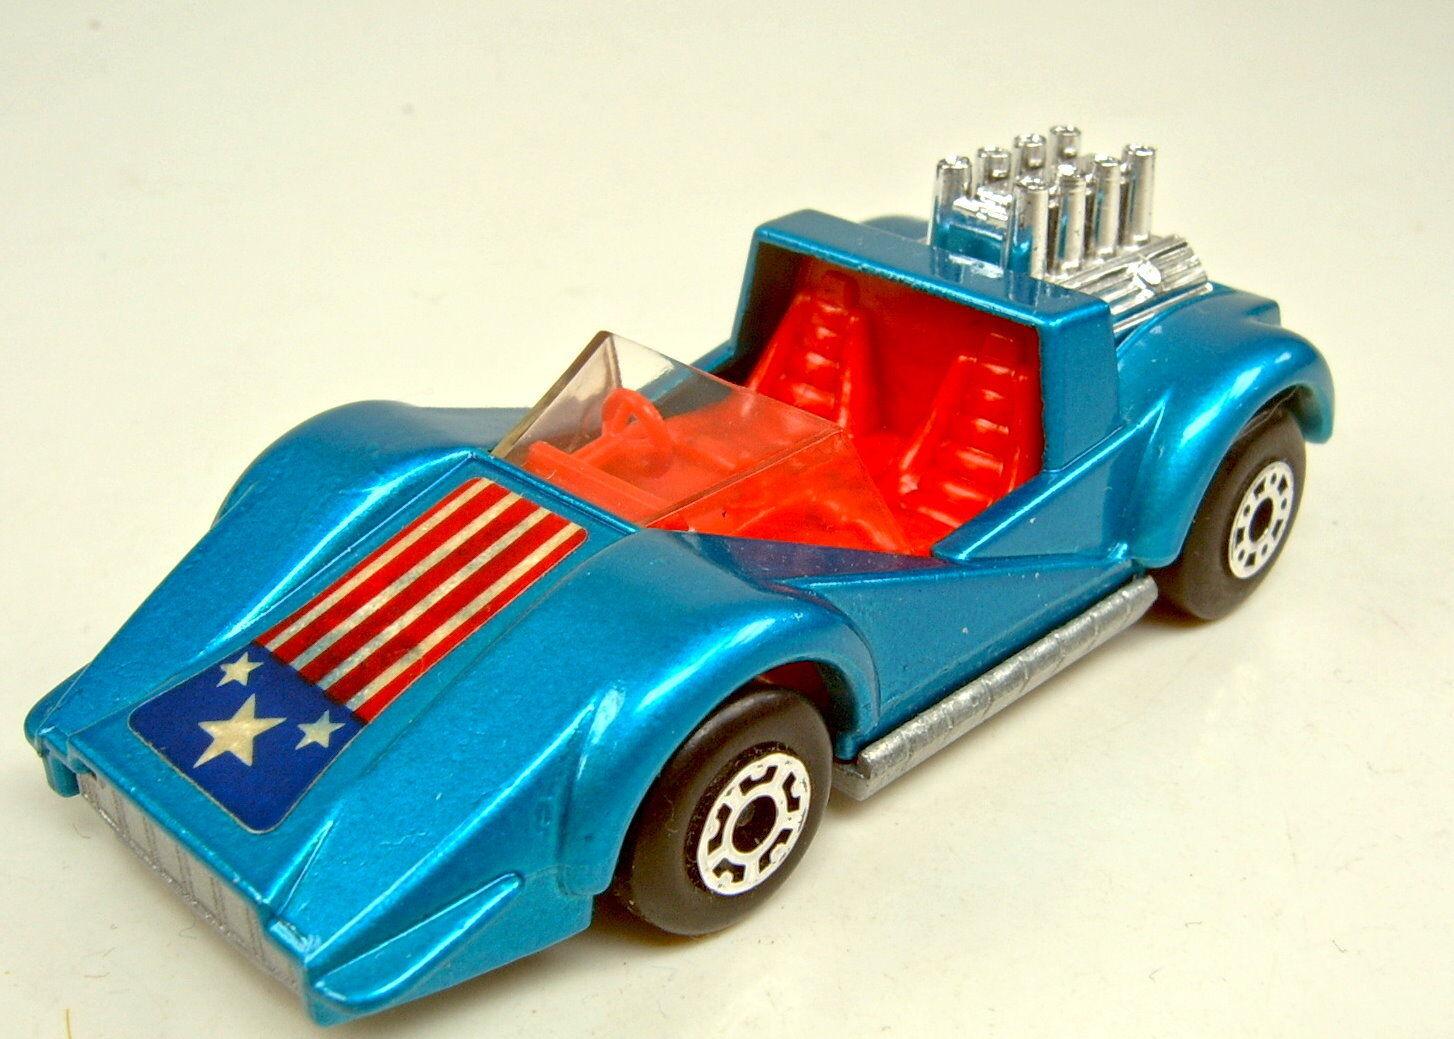 Matchbox Superfast No 55c Hellraiser bluee Metallic Red Body Top